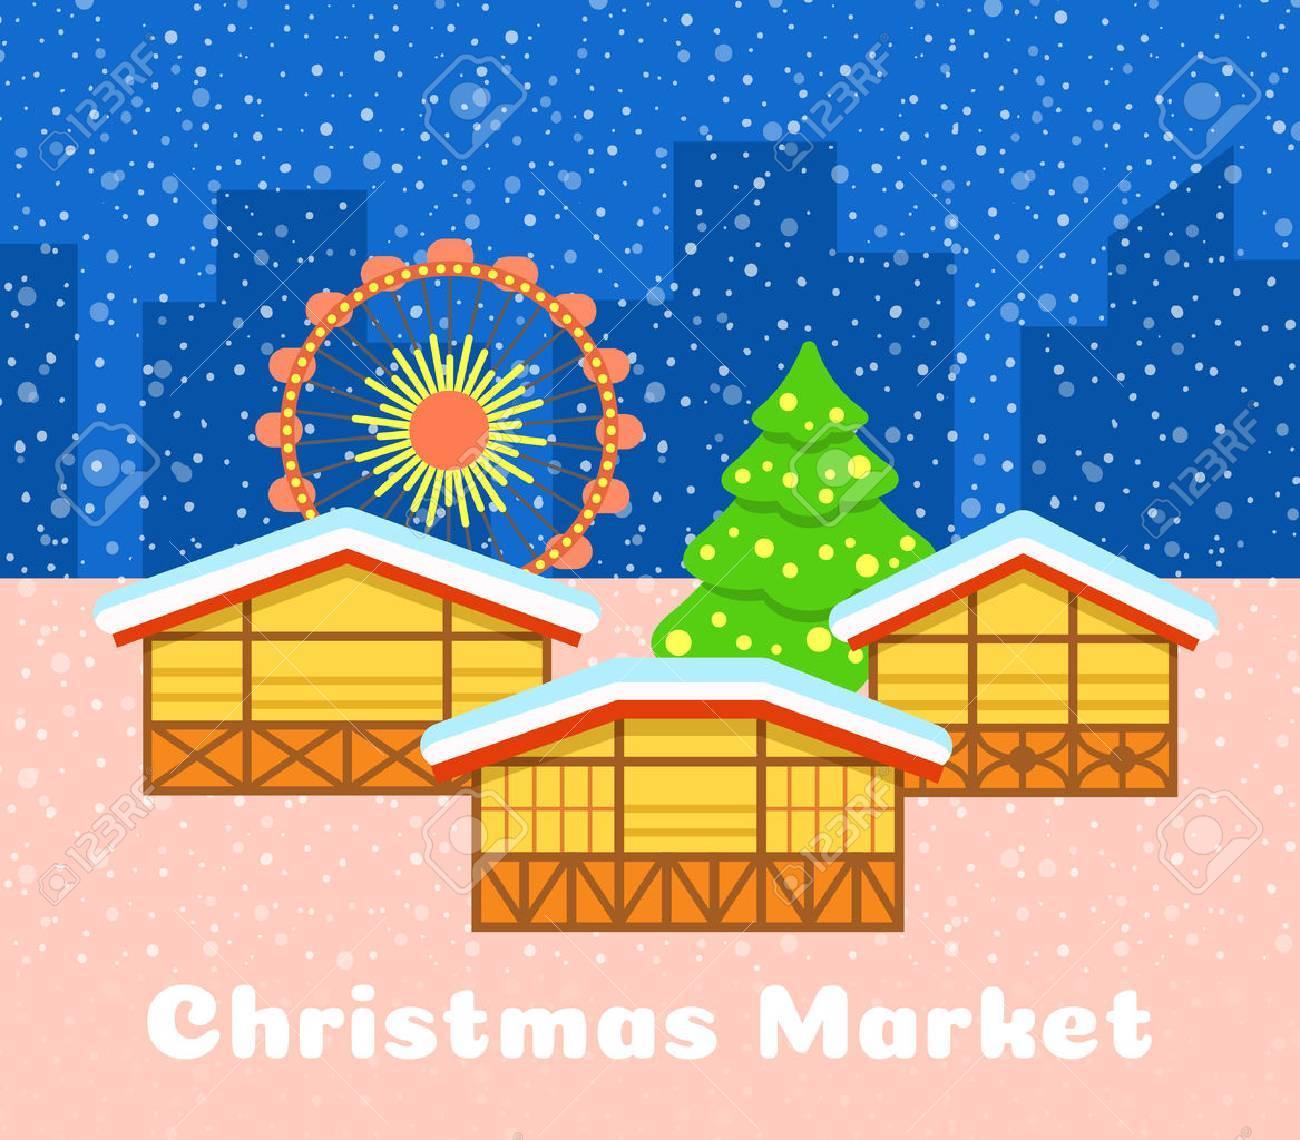 Christmas market vector background. Festive fair illustration. Street stalls, Christmas tree and observation wheel. Urban snowy evening landscape. Traditional celebration of winter holidays - 66620583